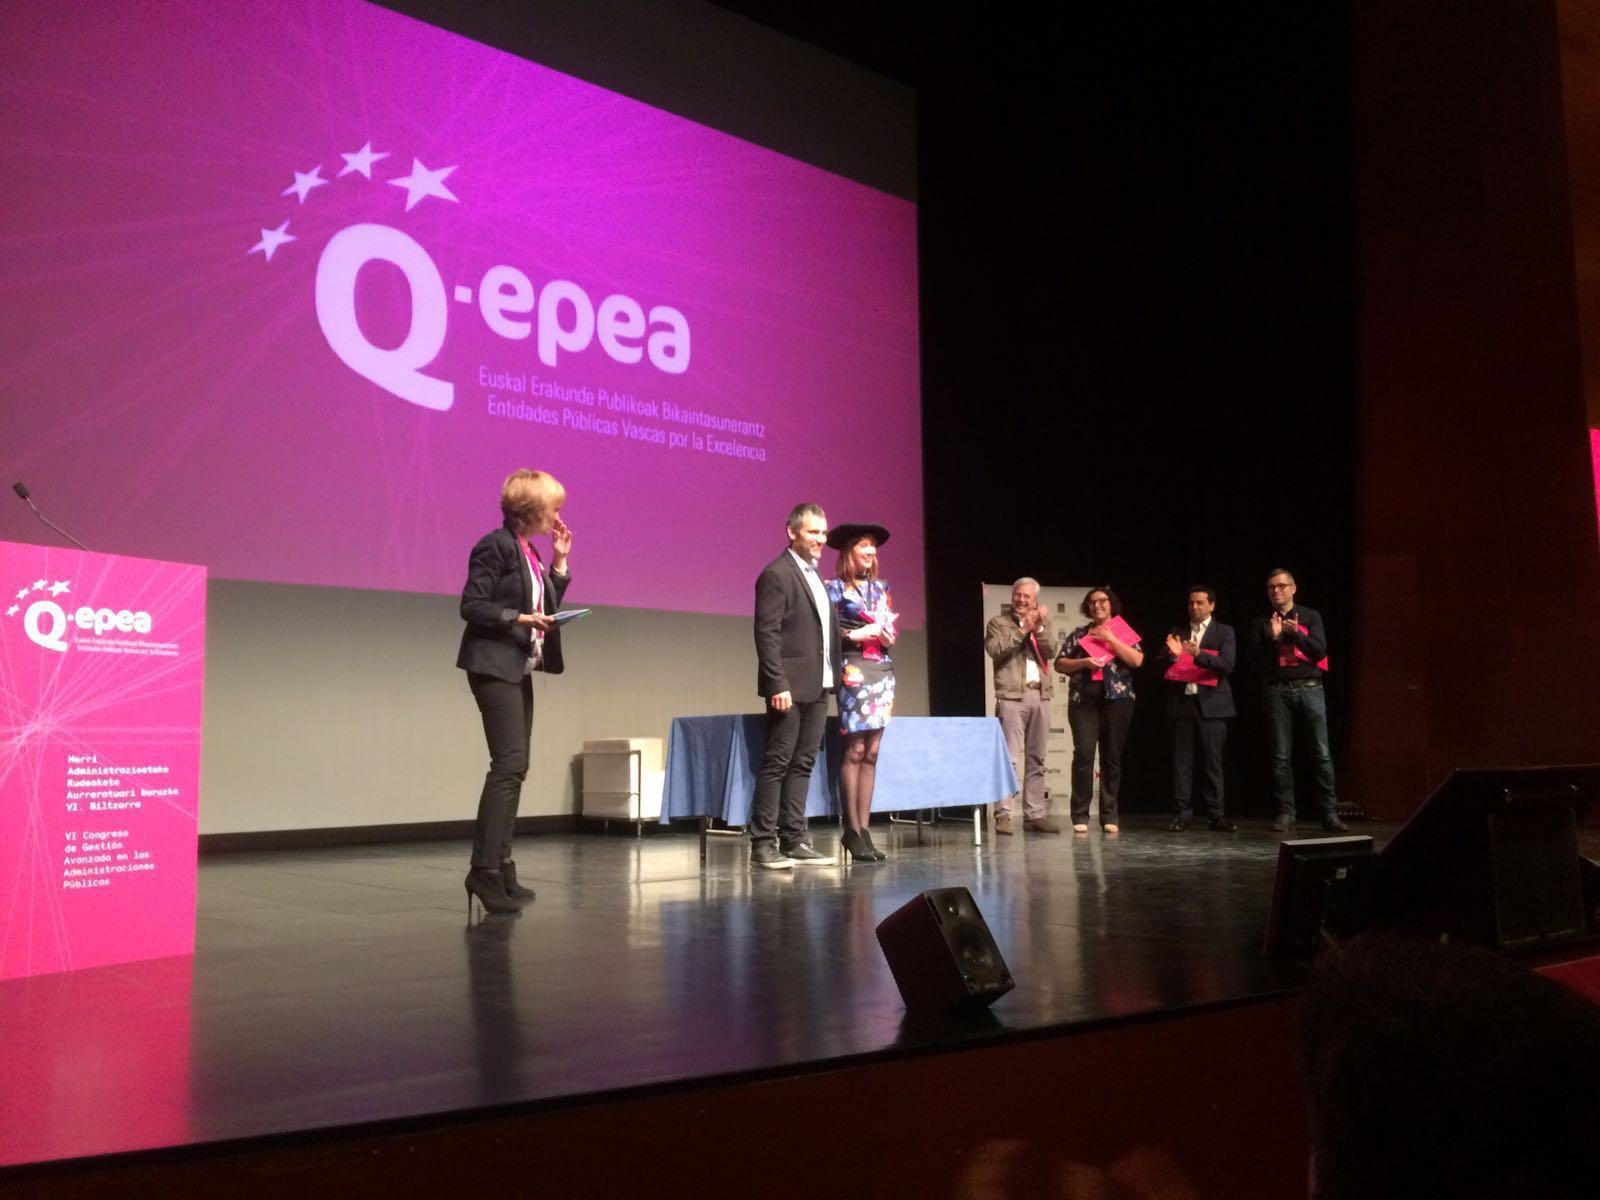 carewell-proyecto-europeo-premio-q-epea-osakidetza-kronikgune